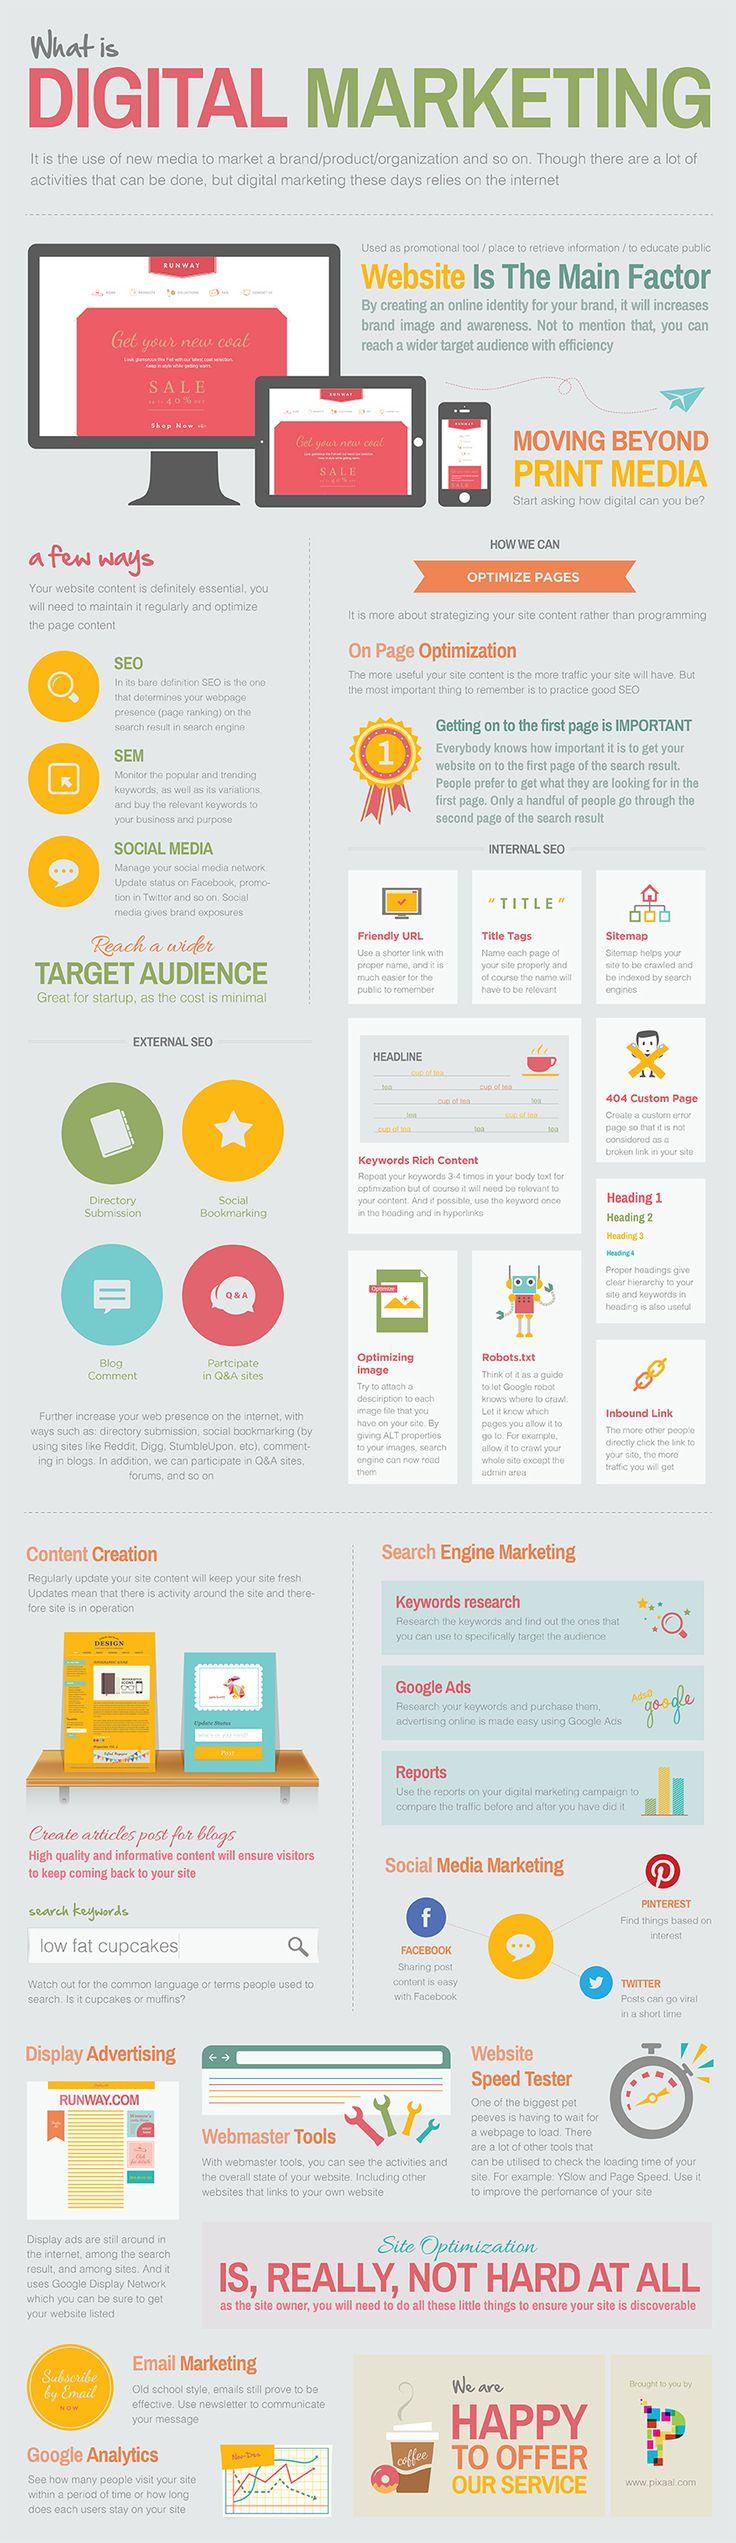 infographic - digital marketing